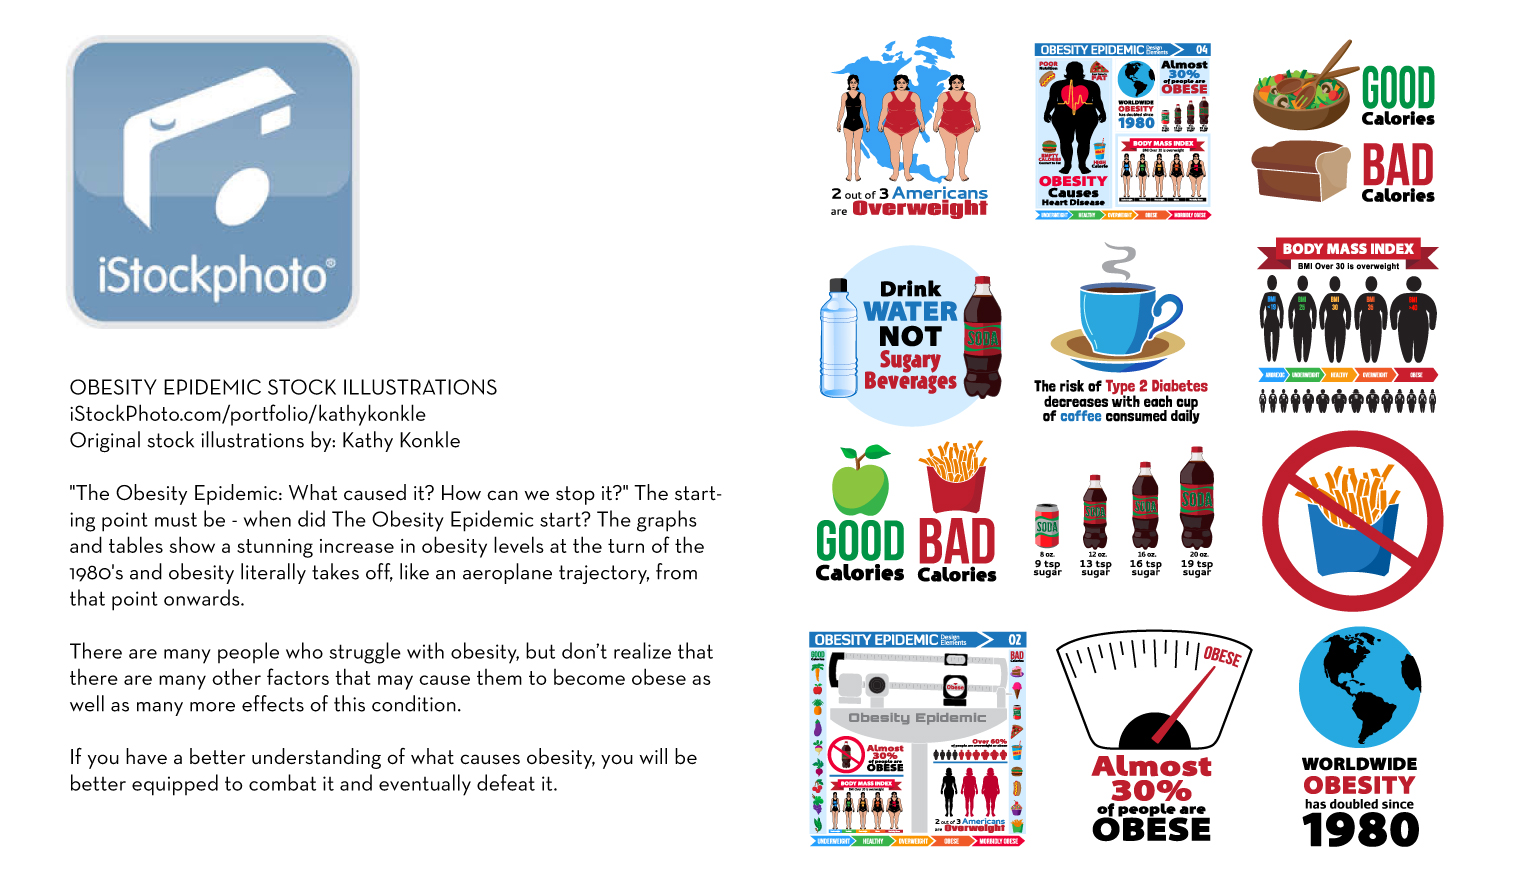 obesity.jpg